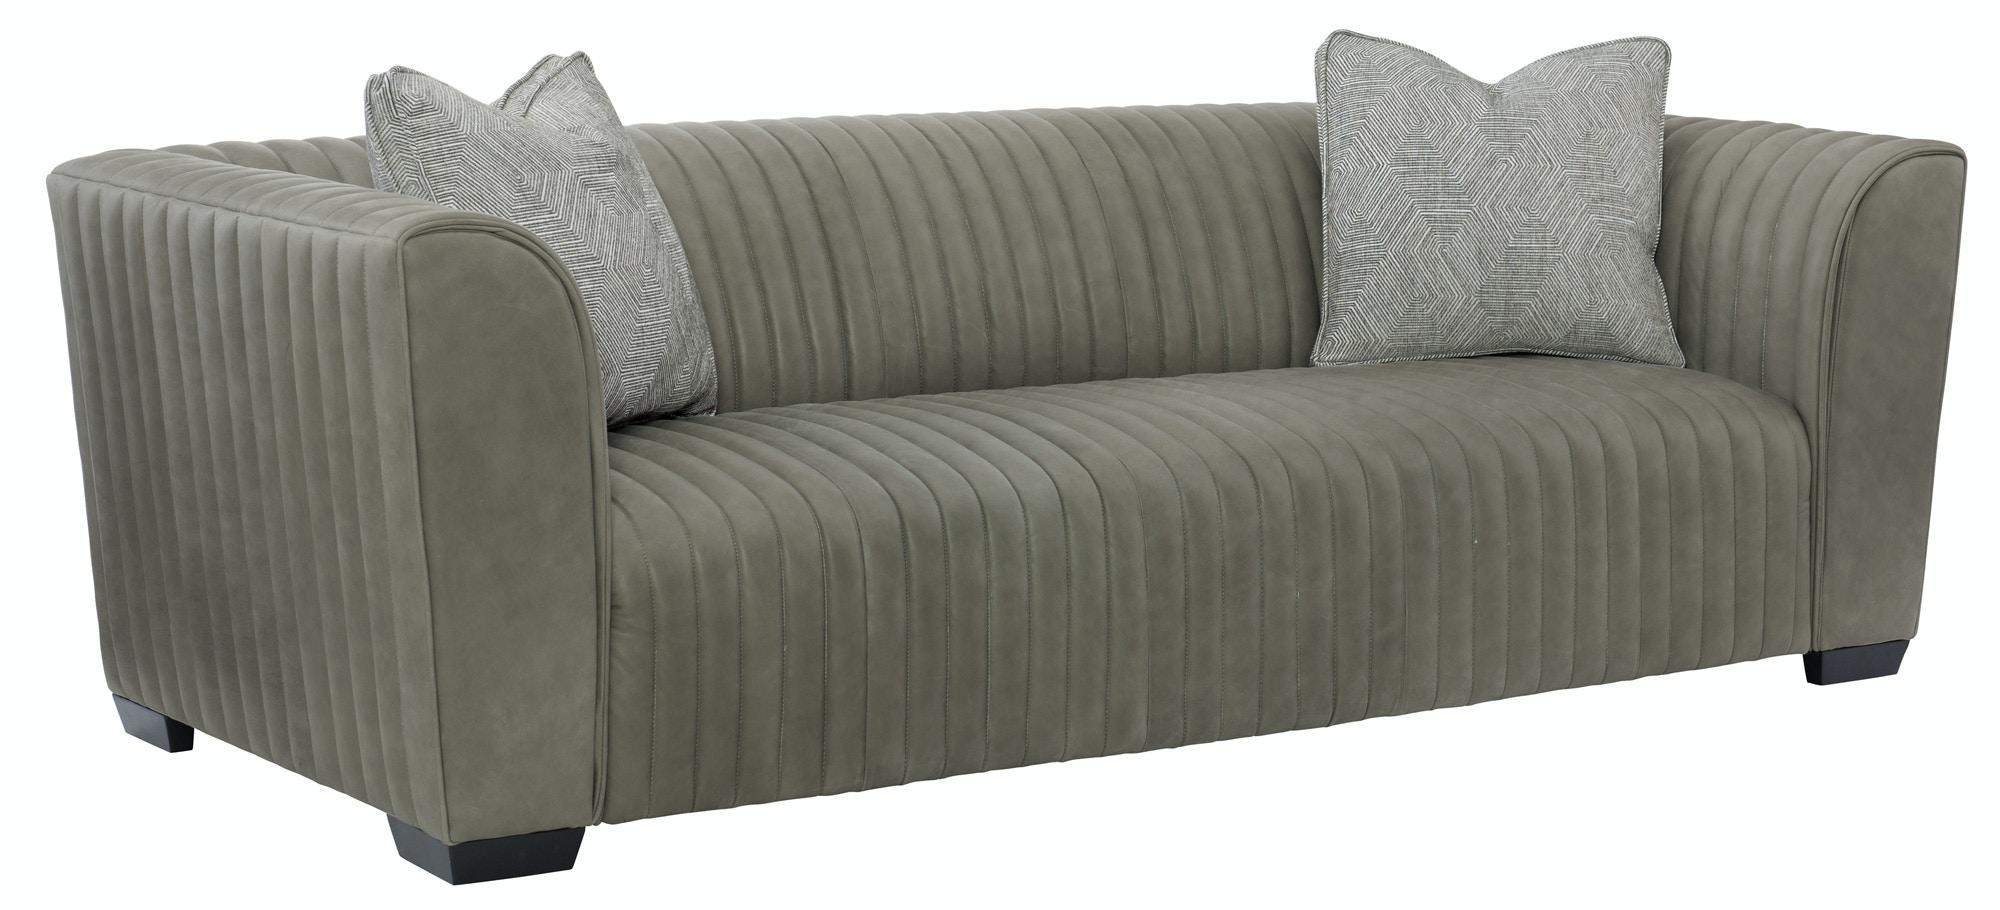 Bernhardt Furniture Kent Sofa 2577L